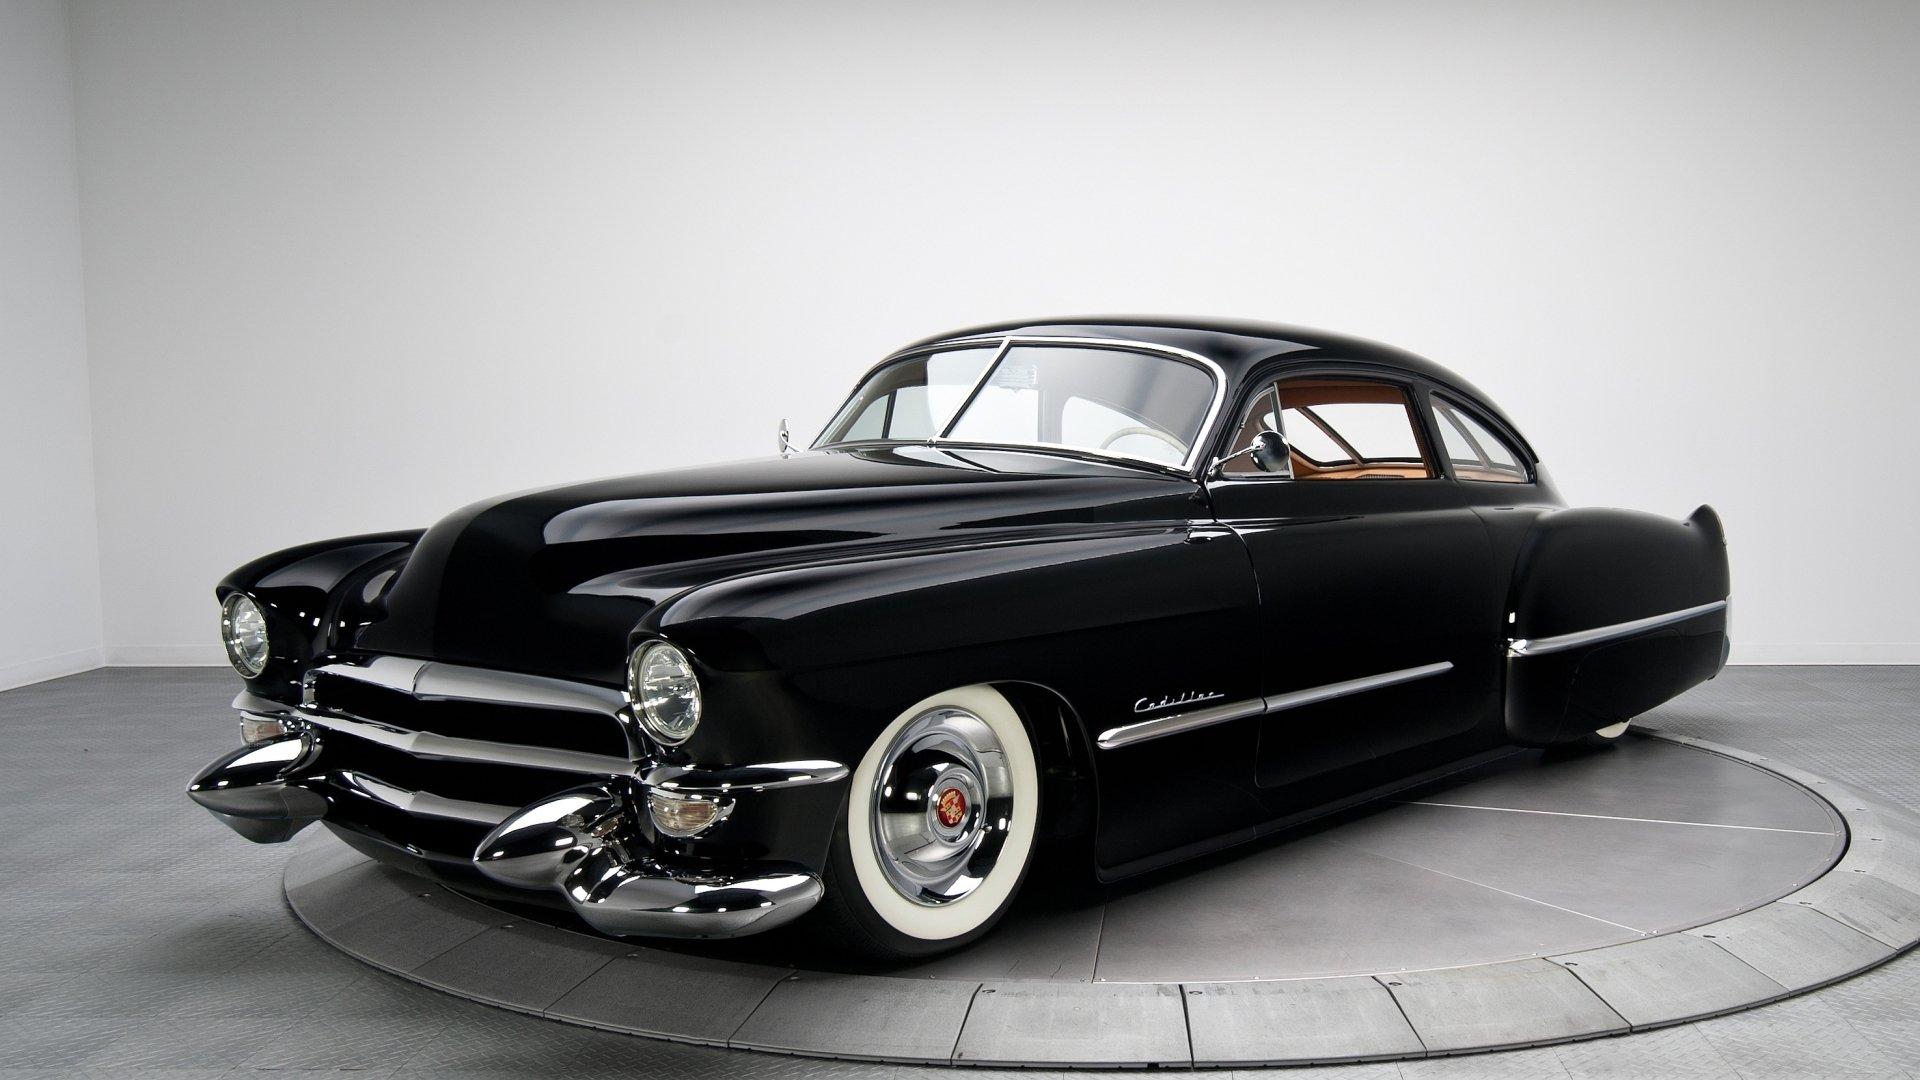 50s Classic Cars Wallpaper Cadillac Computer Wallpapers Desktop Backgrounds